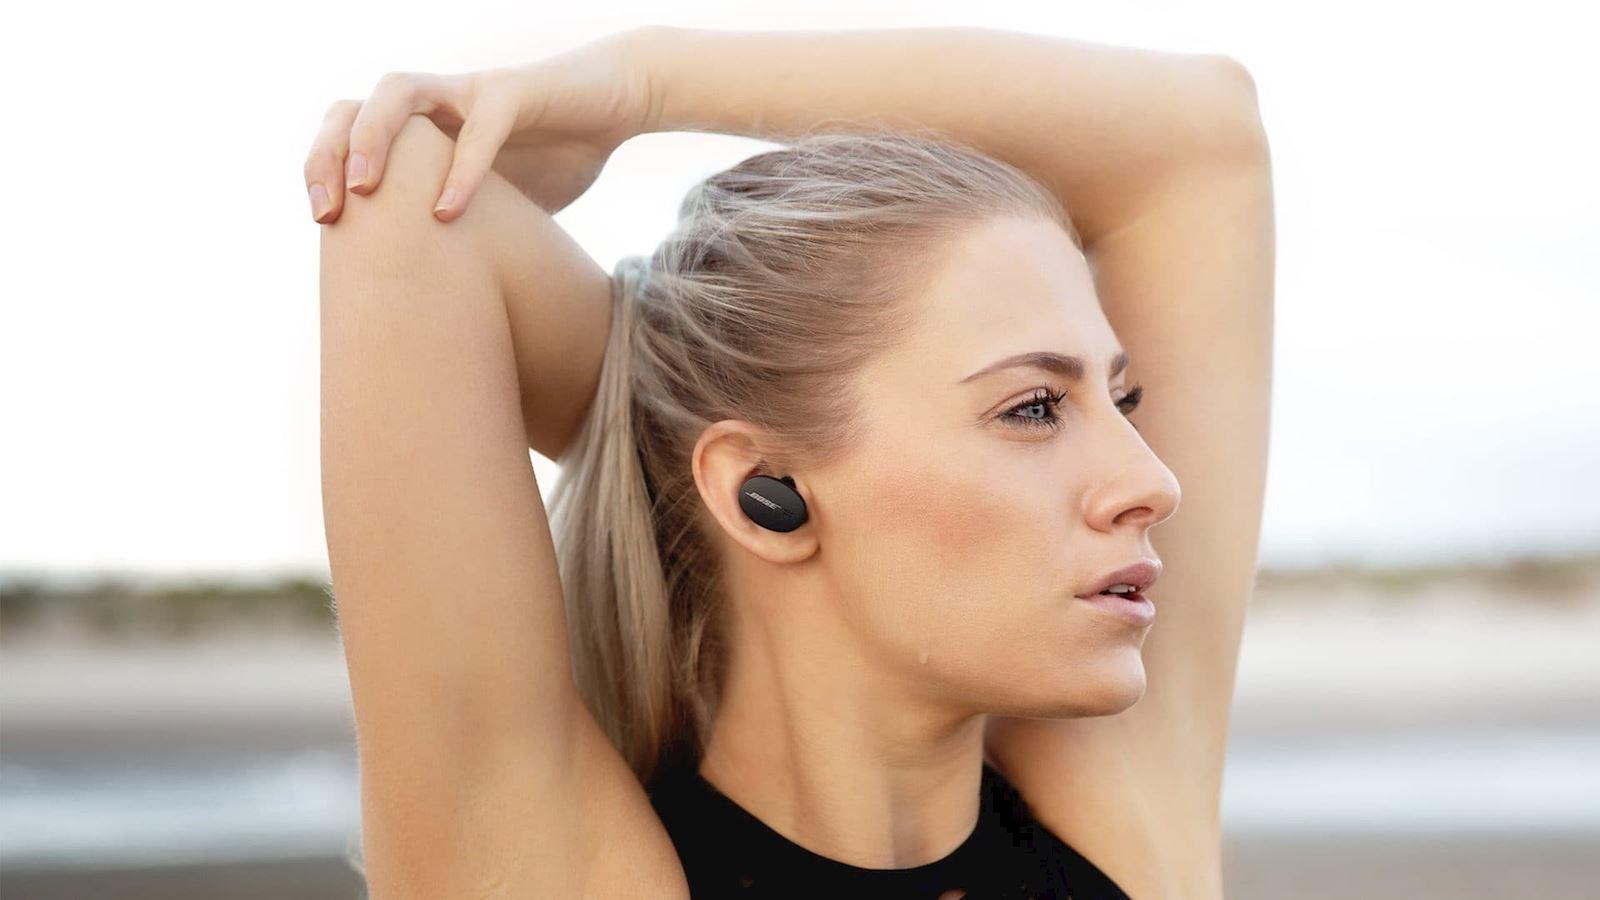 tai nghe Bose Sport Earbuds chính hãng - anhduyen audio 2